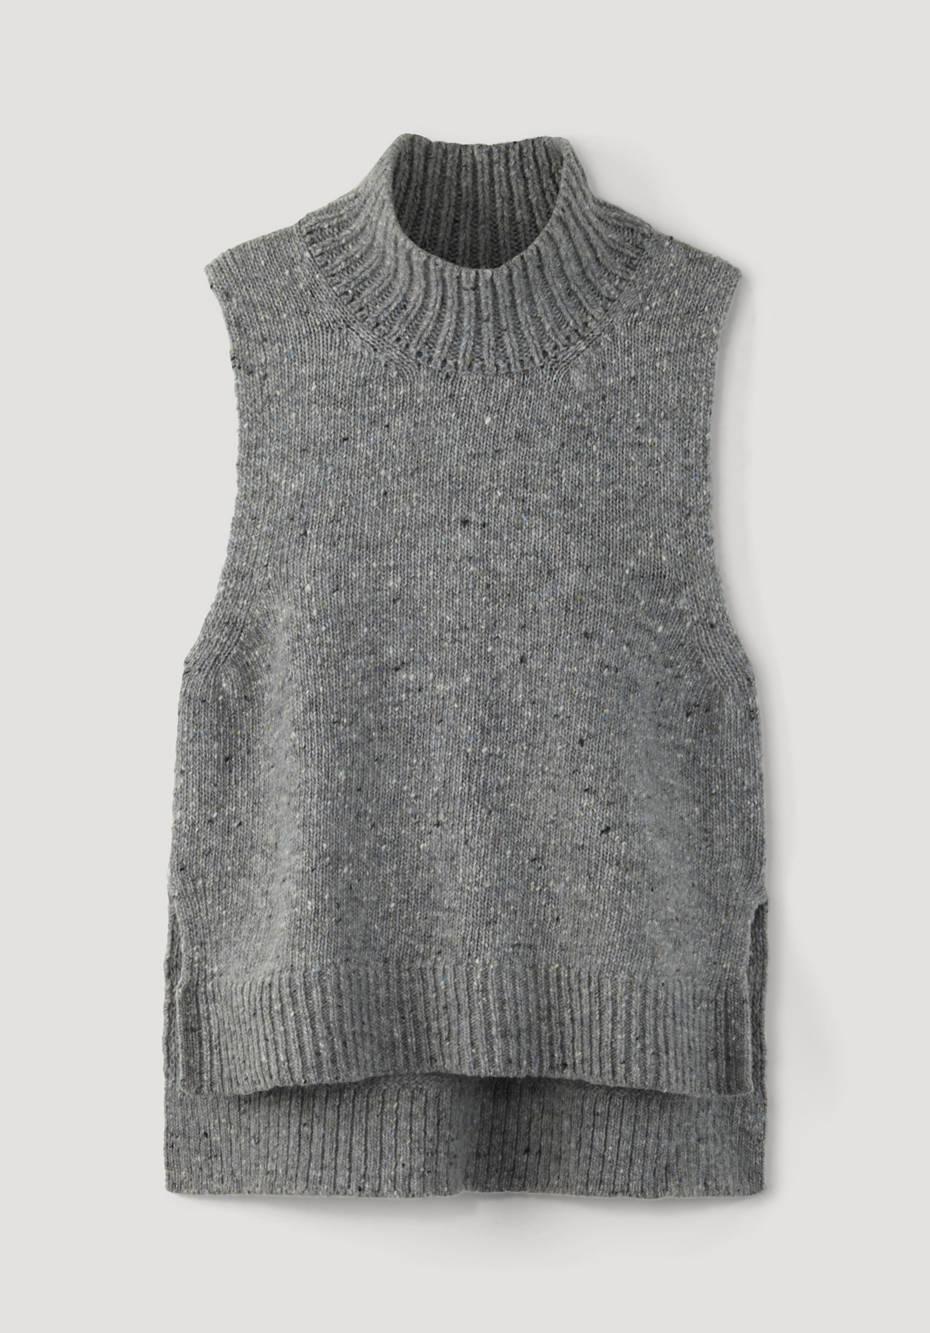 Tweed tank top made of pure new wool